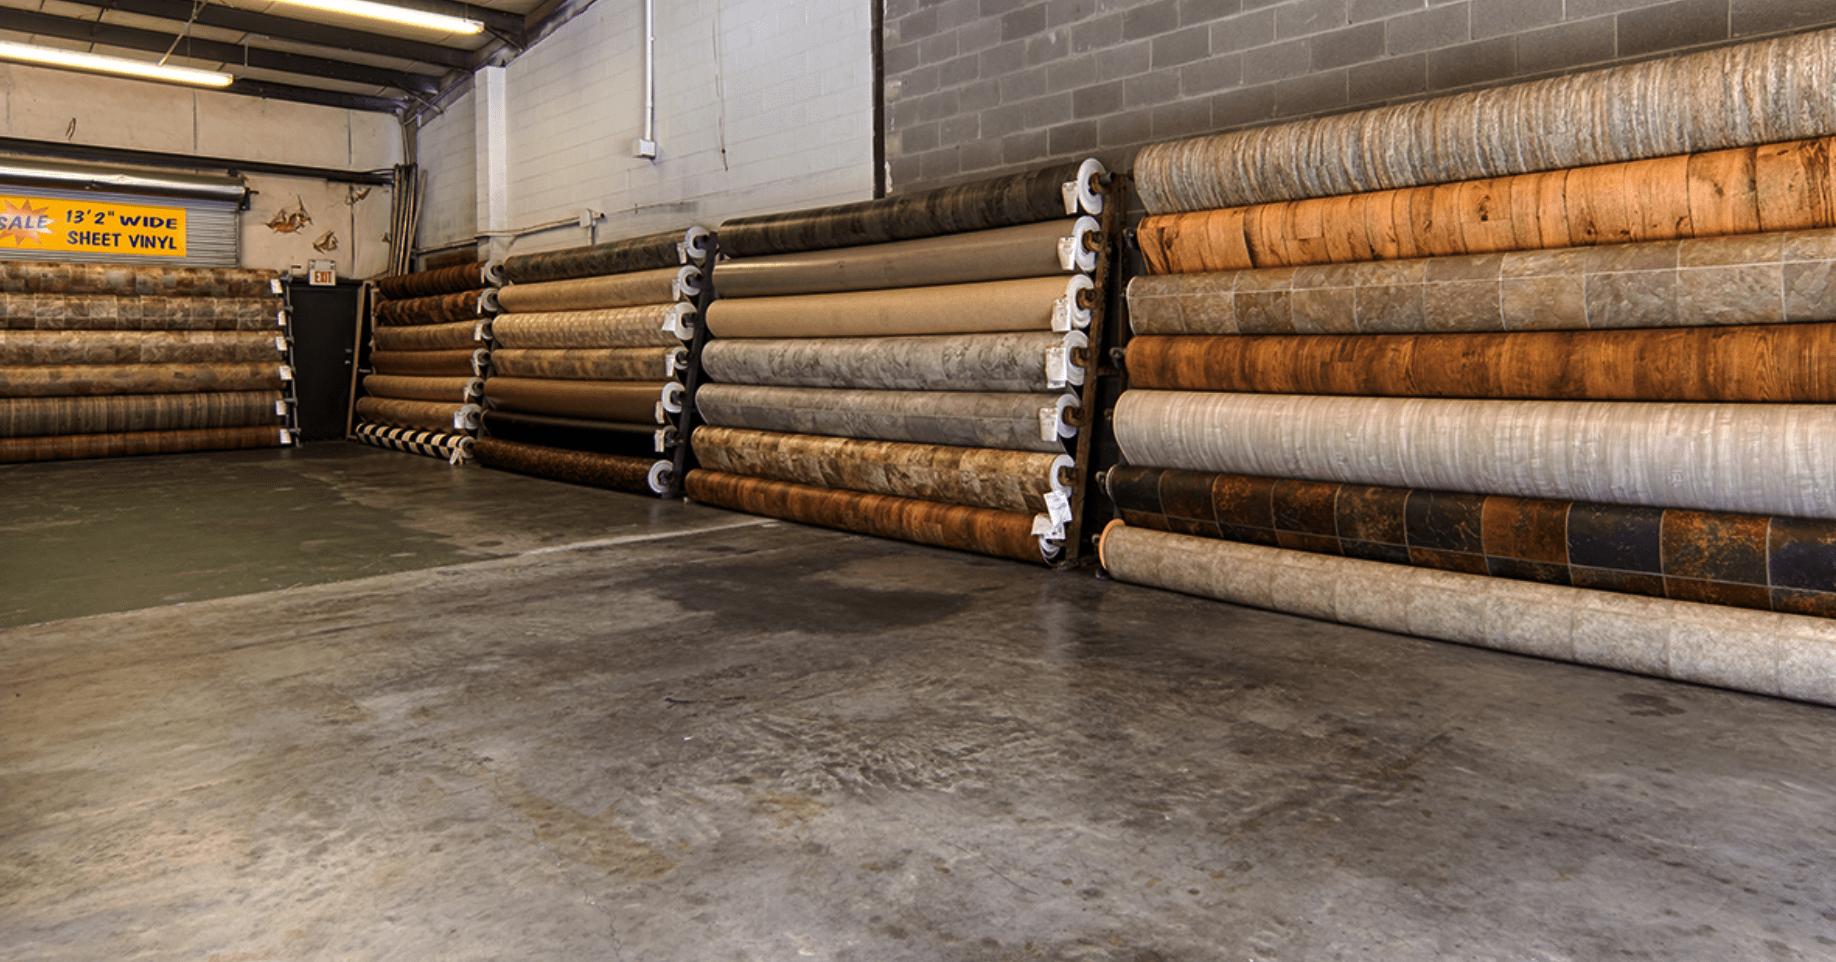 Vinyl flooring in Myrtle Beach, SC from the Waccamaw Floor Covering showroom